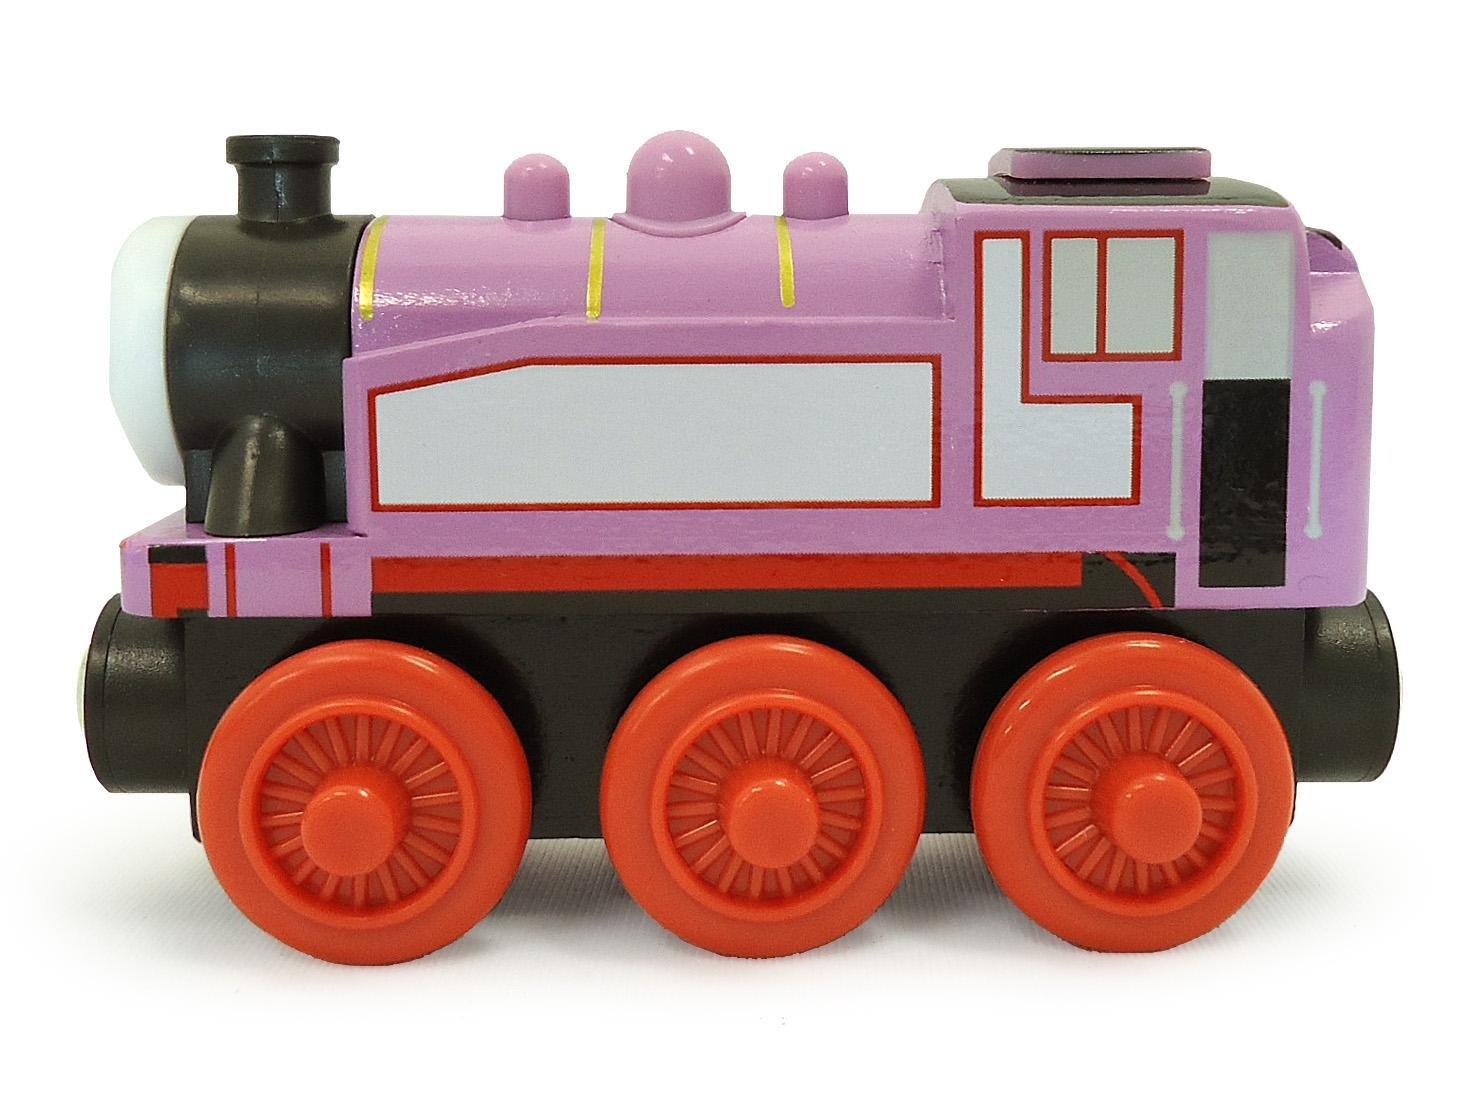 Rosie train coloring - Amazon Com Fisher Price Thomas The Train Wooden Railway Rosie Toys Games